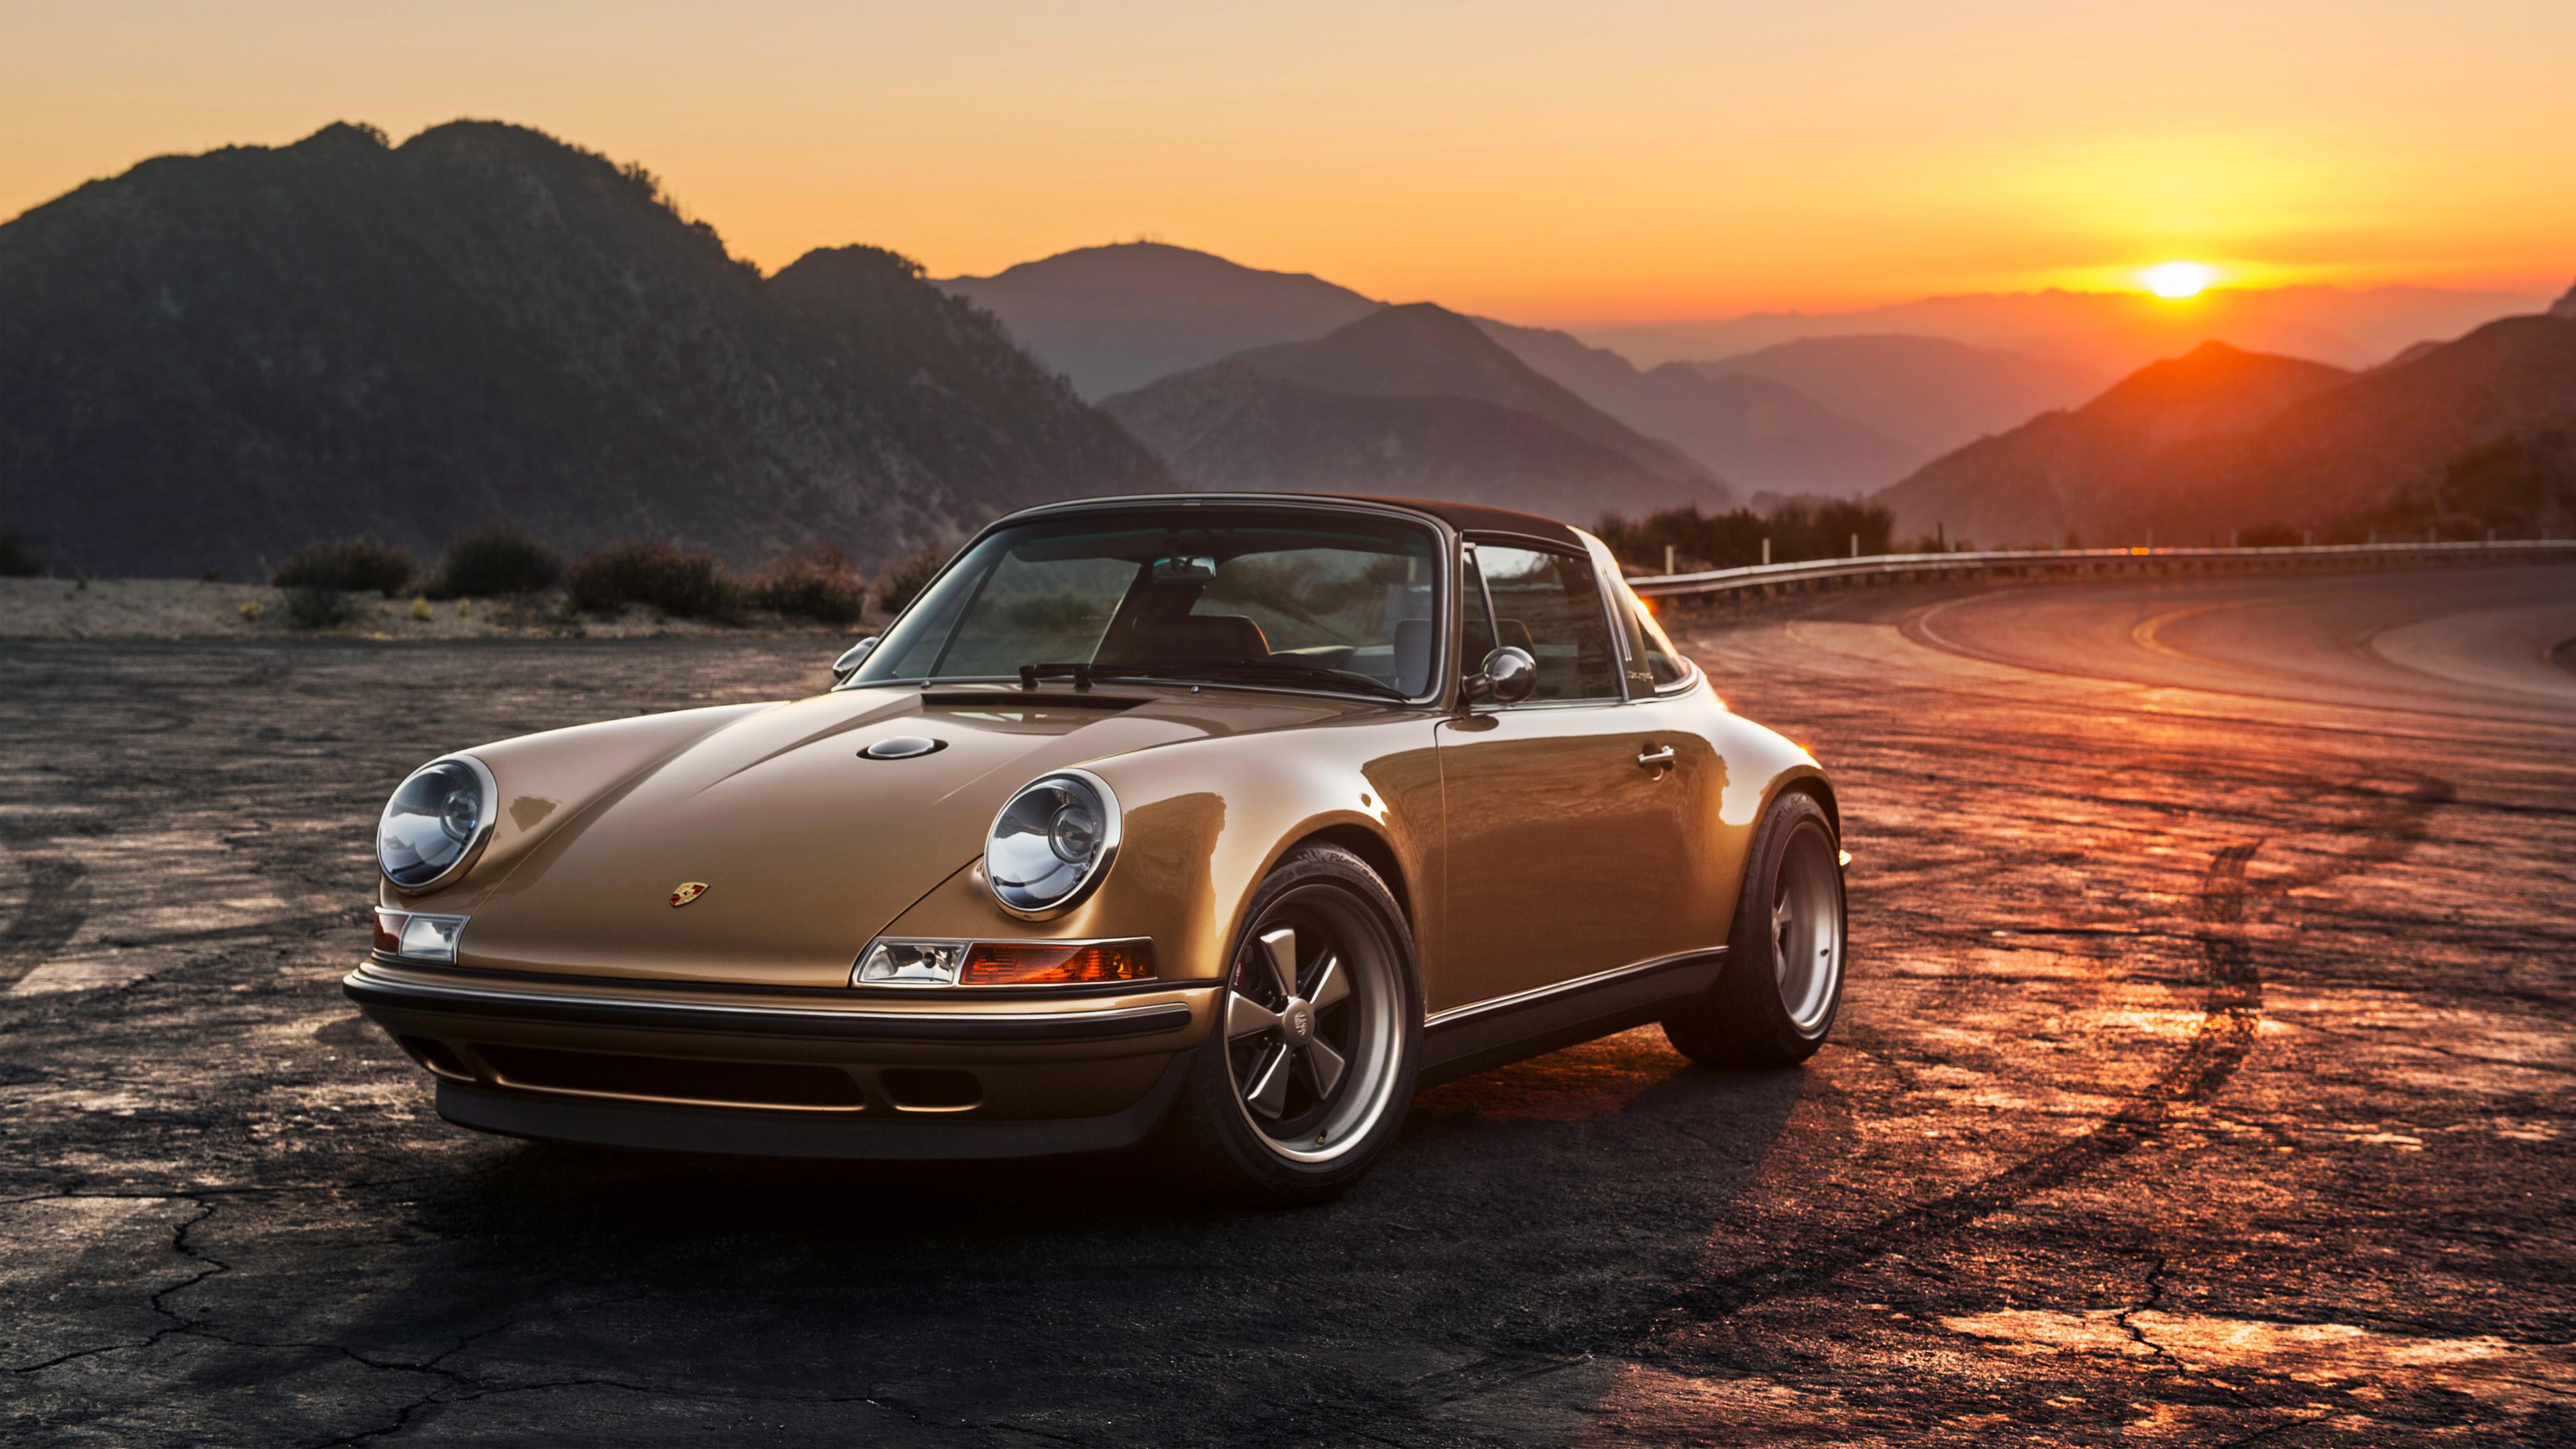 Supercar Wallpaper 2015 Singer Porsche 911 Targa Wallpaper Hd Car Wallpapers